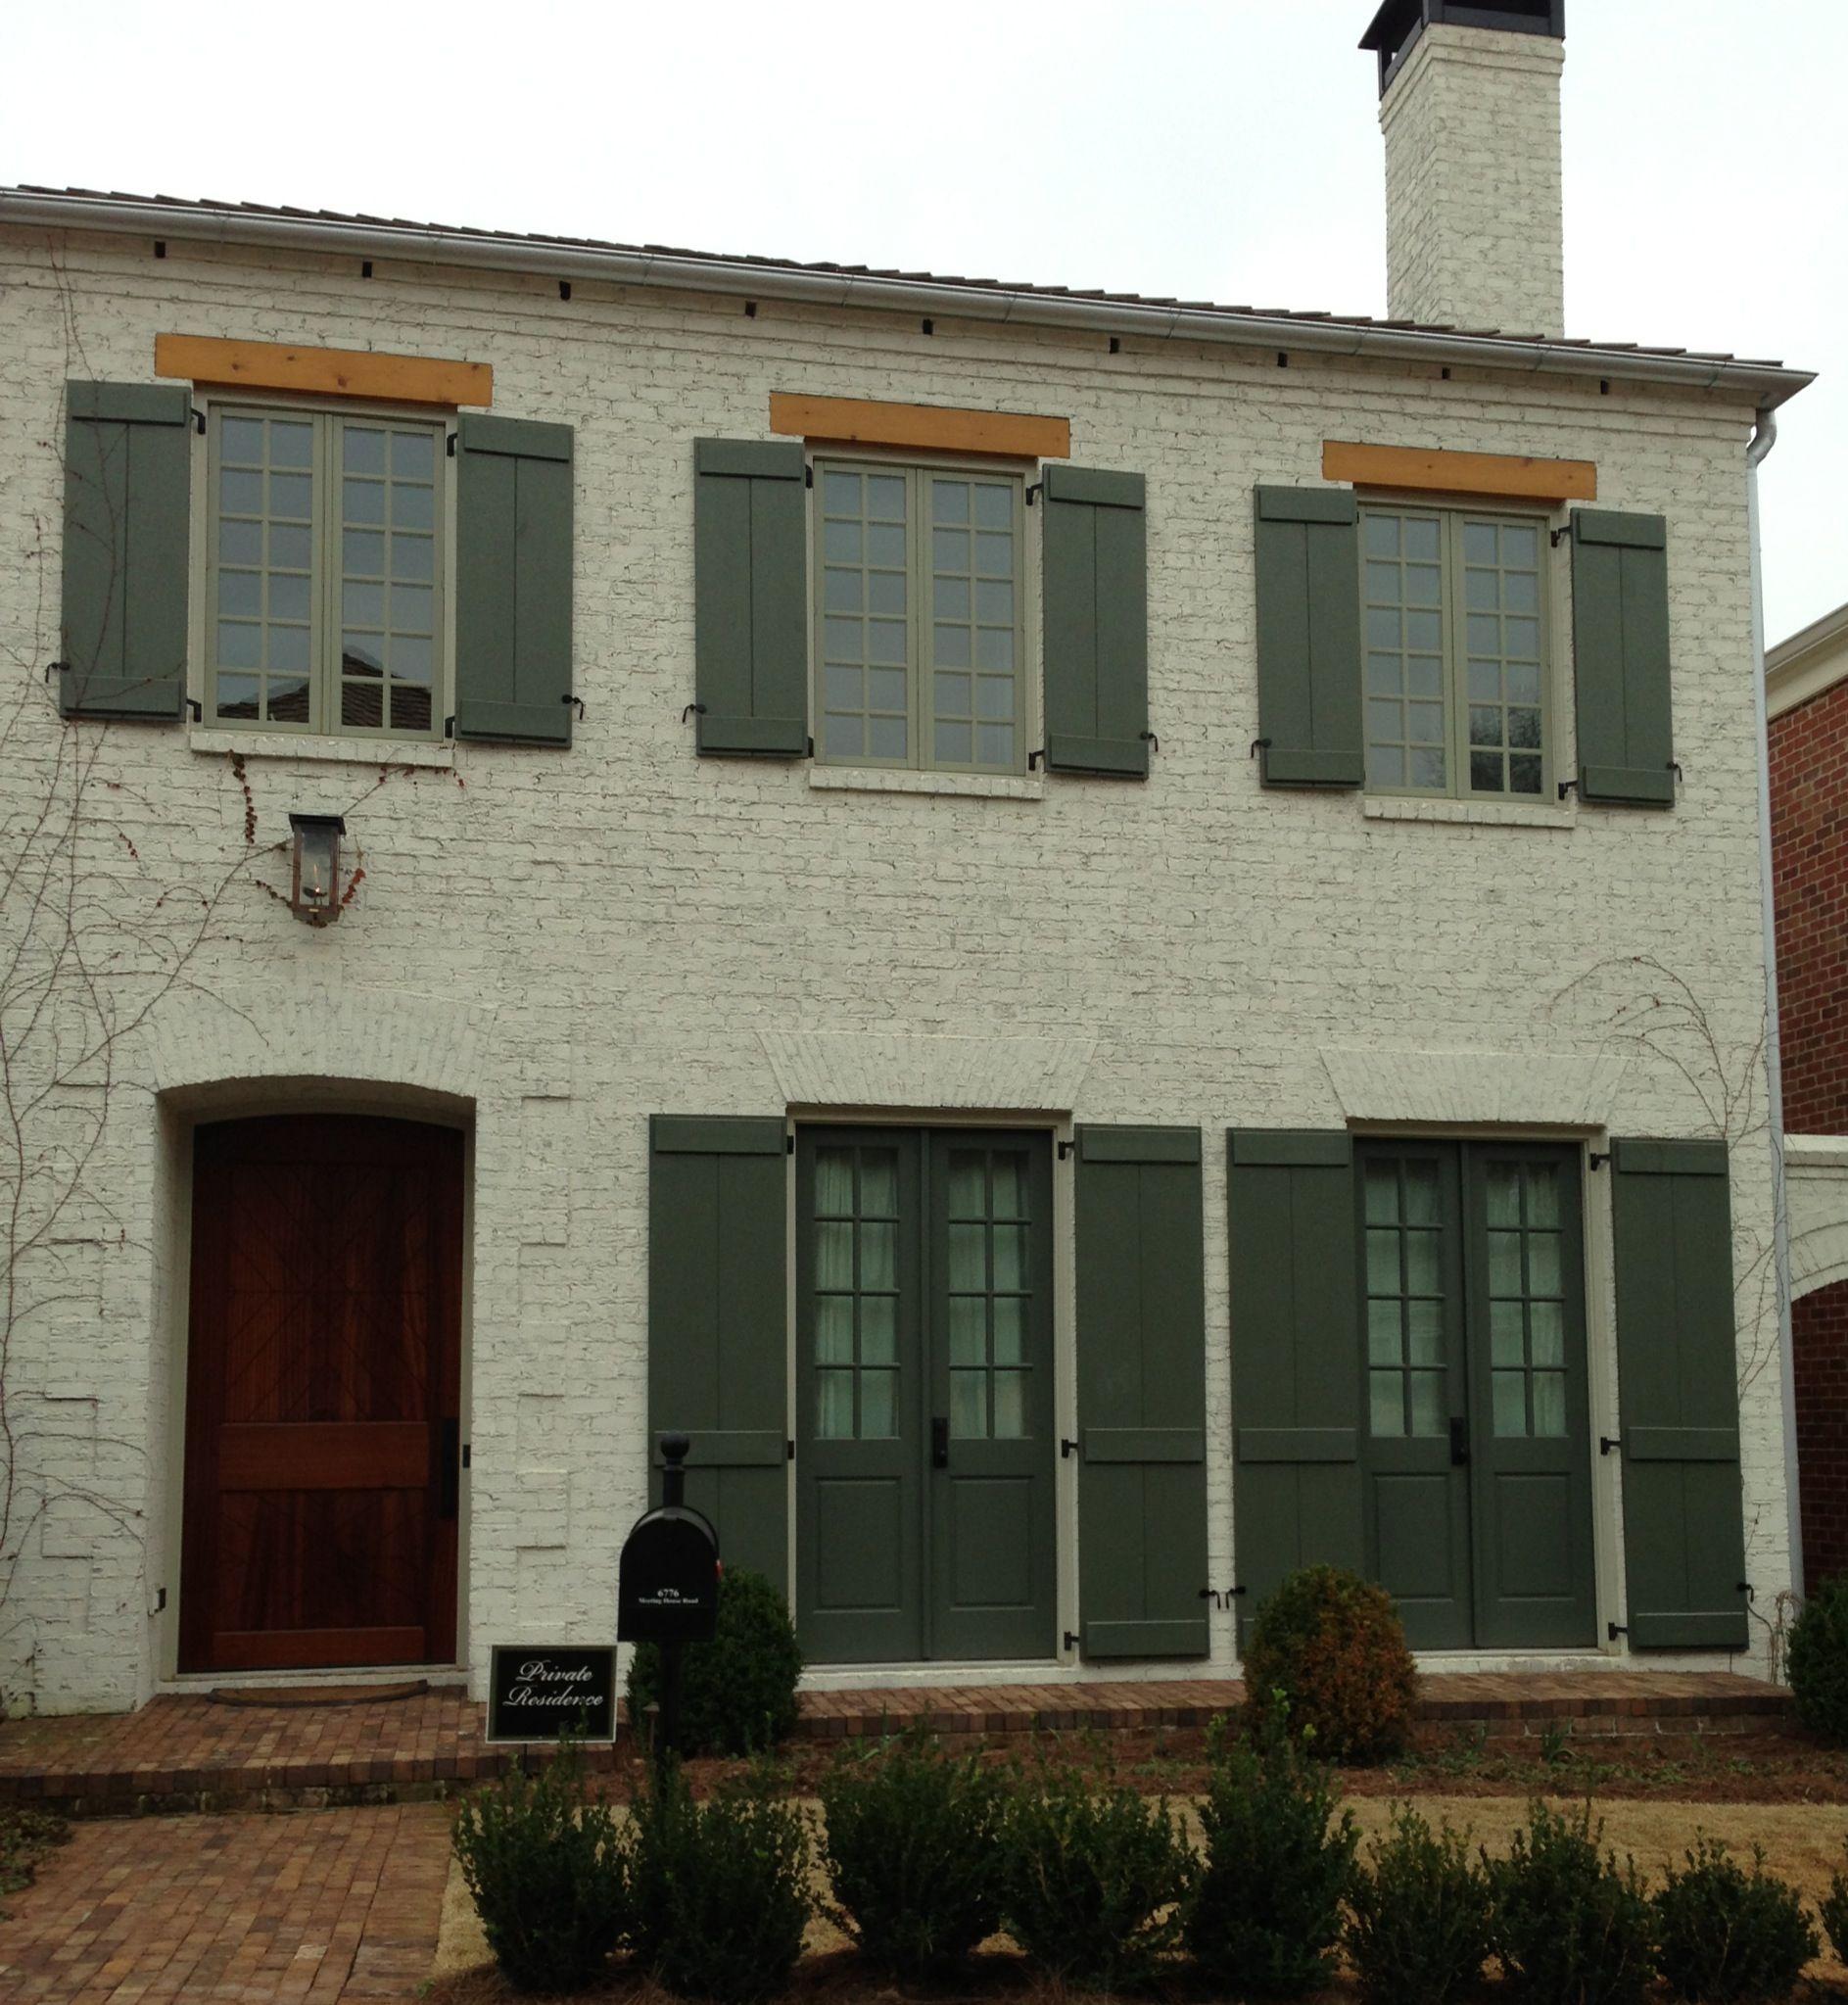 Exterior painted brick | New house ideas | Pinterest on Brick House Painting Ideas  id=85216